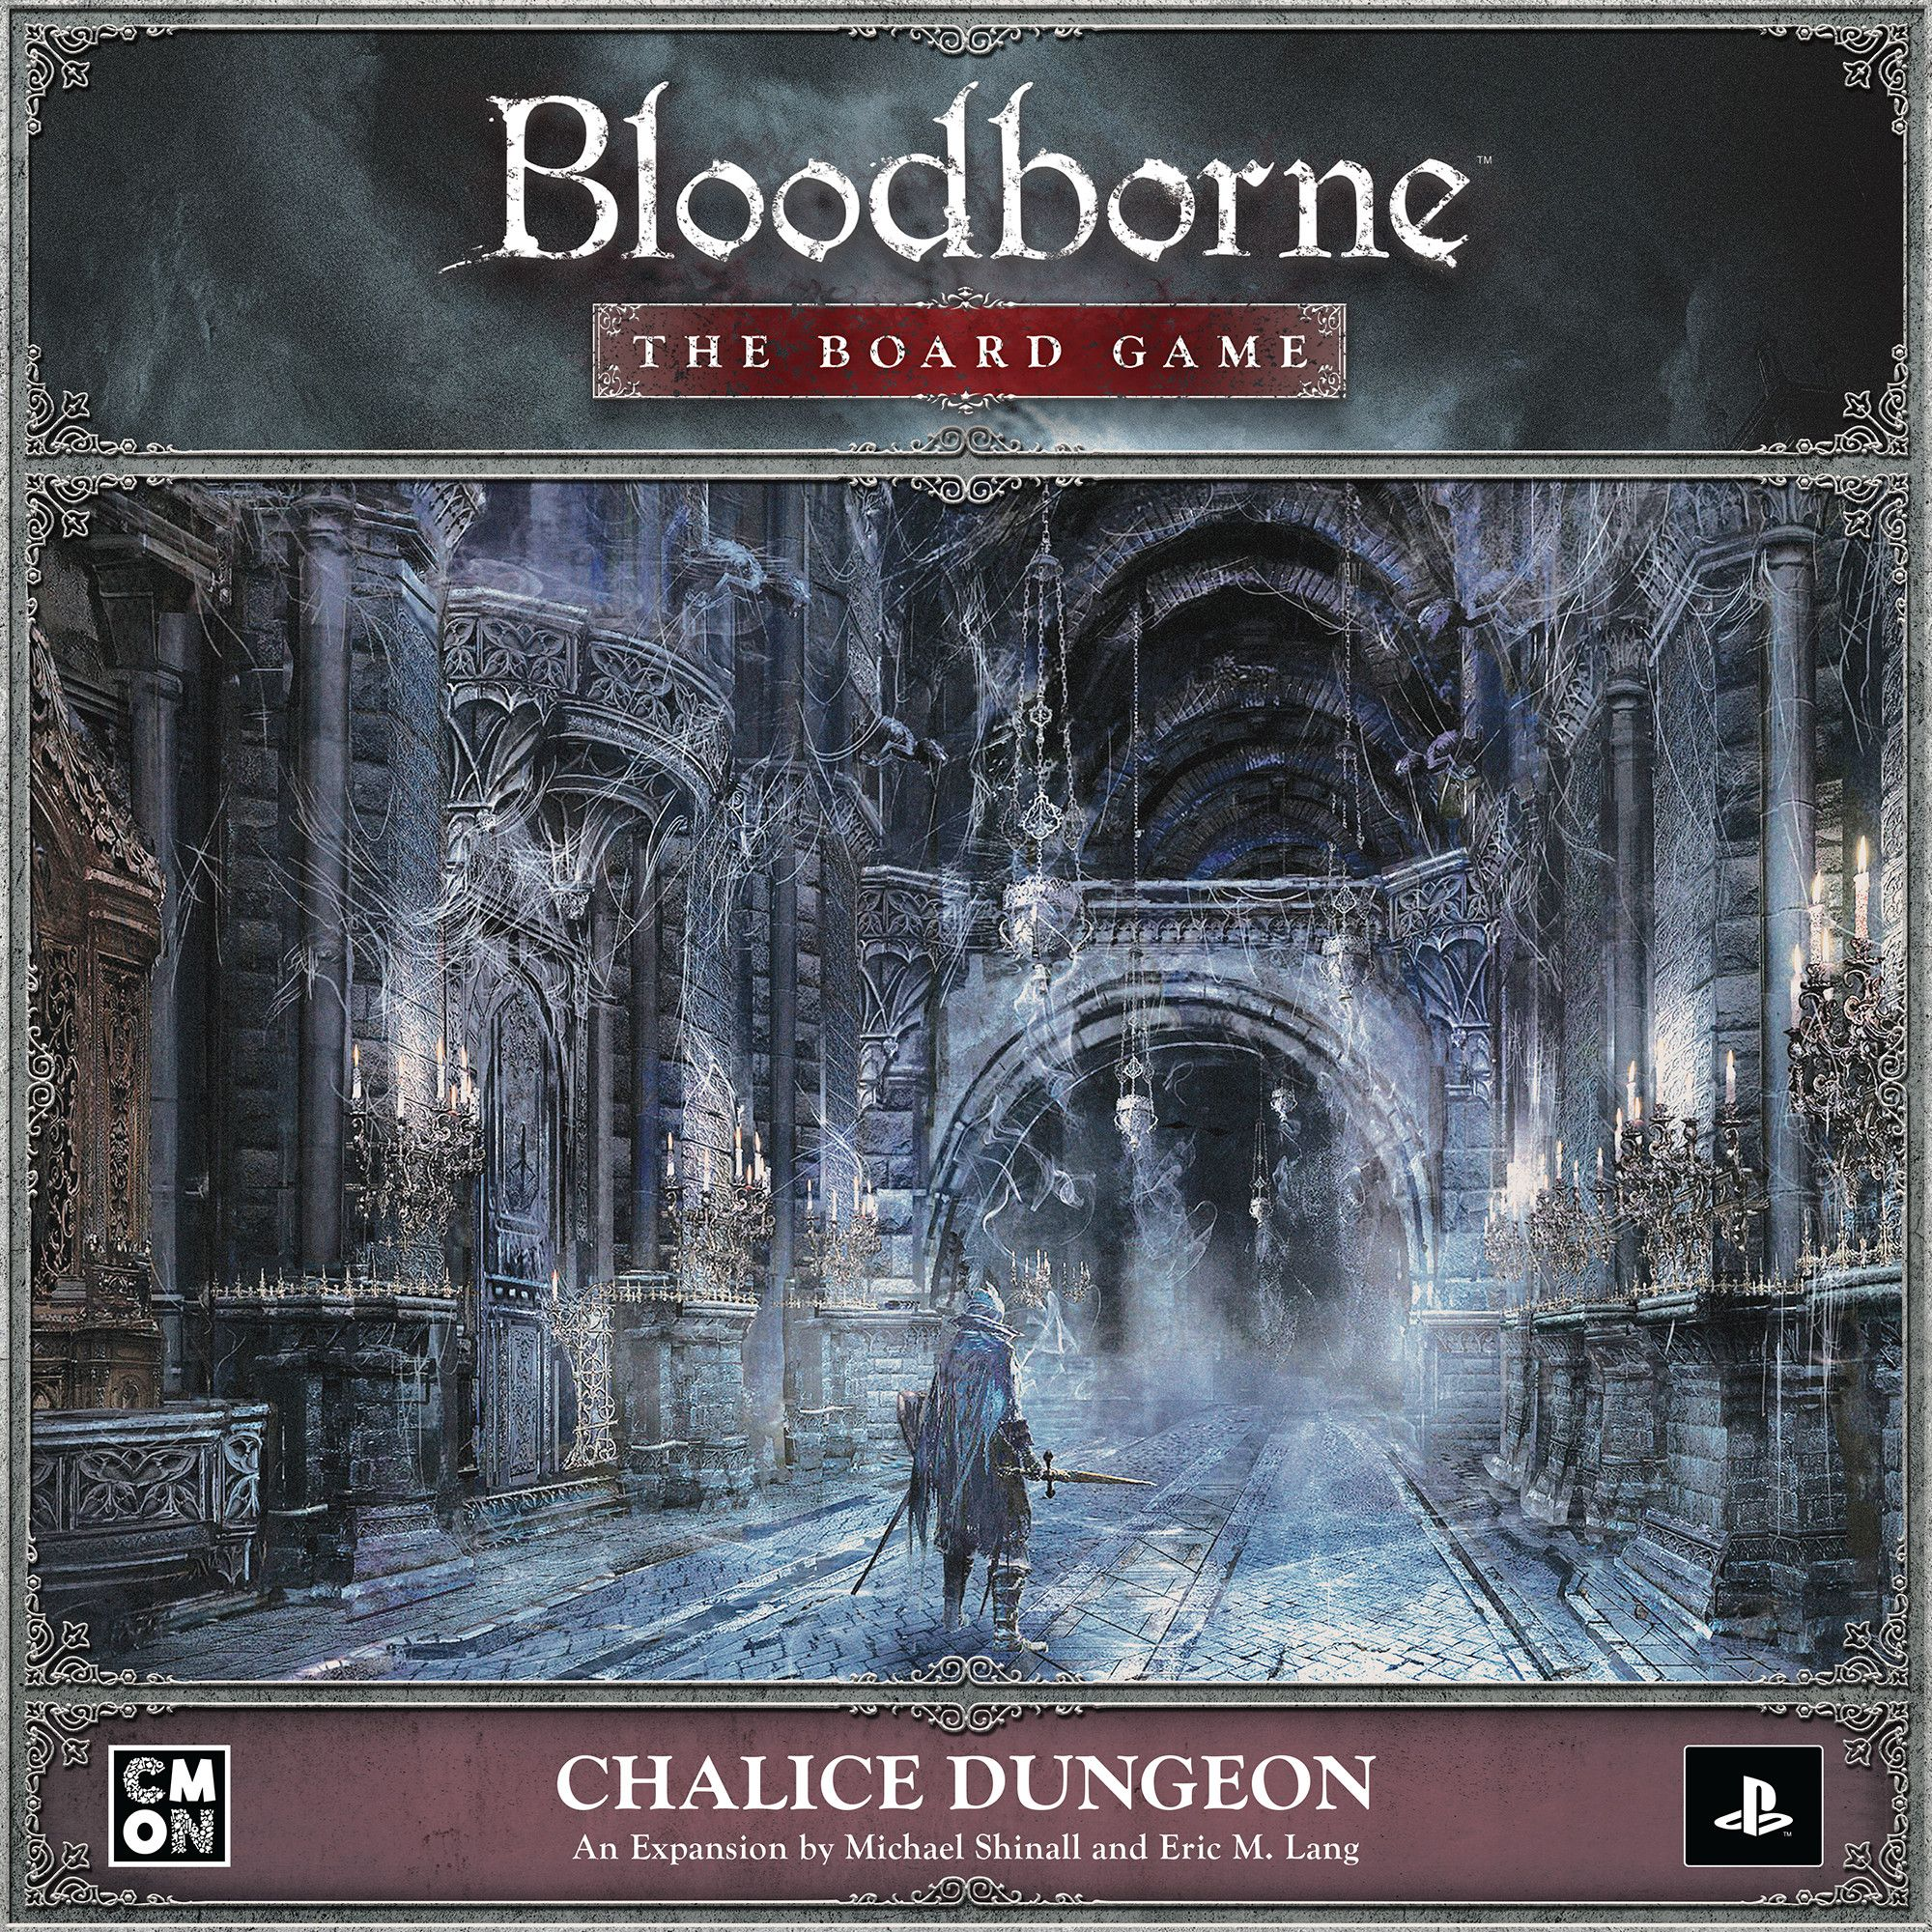 Bloodborne: The Board Game  Chalice Dungeon